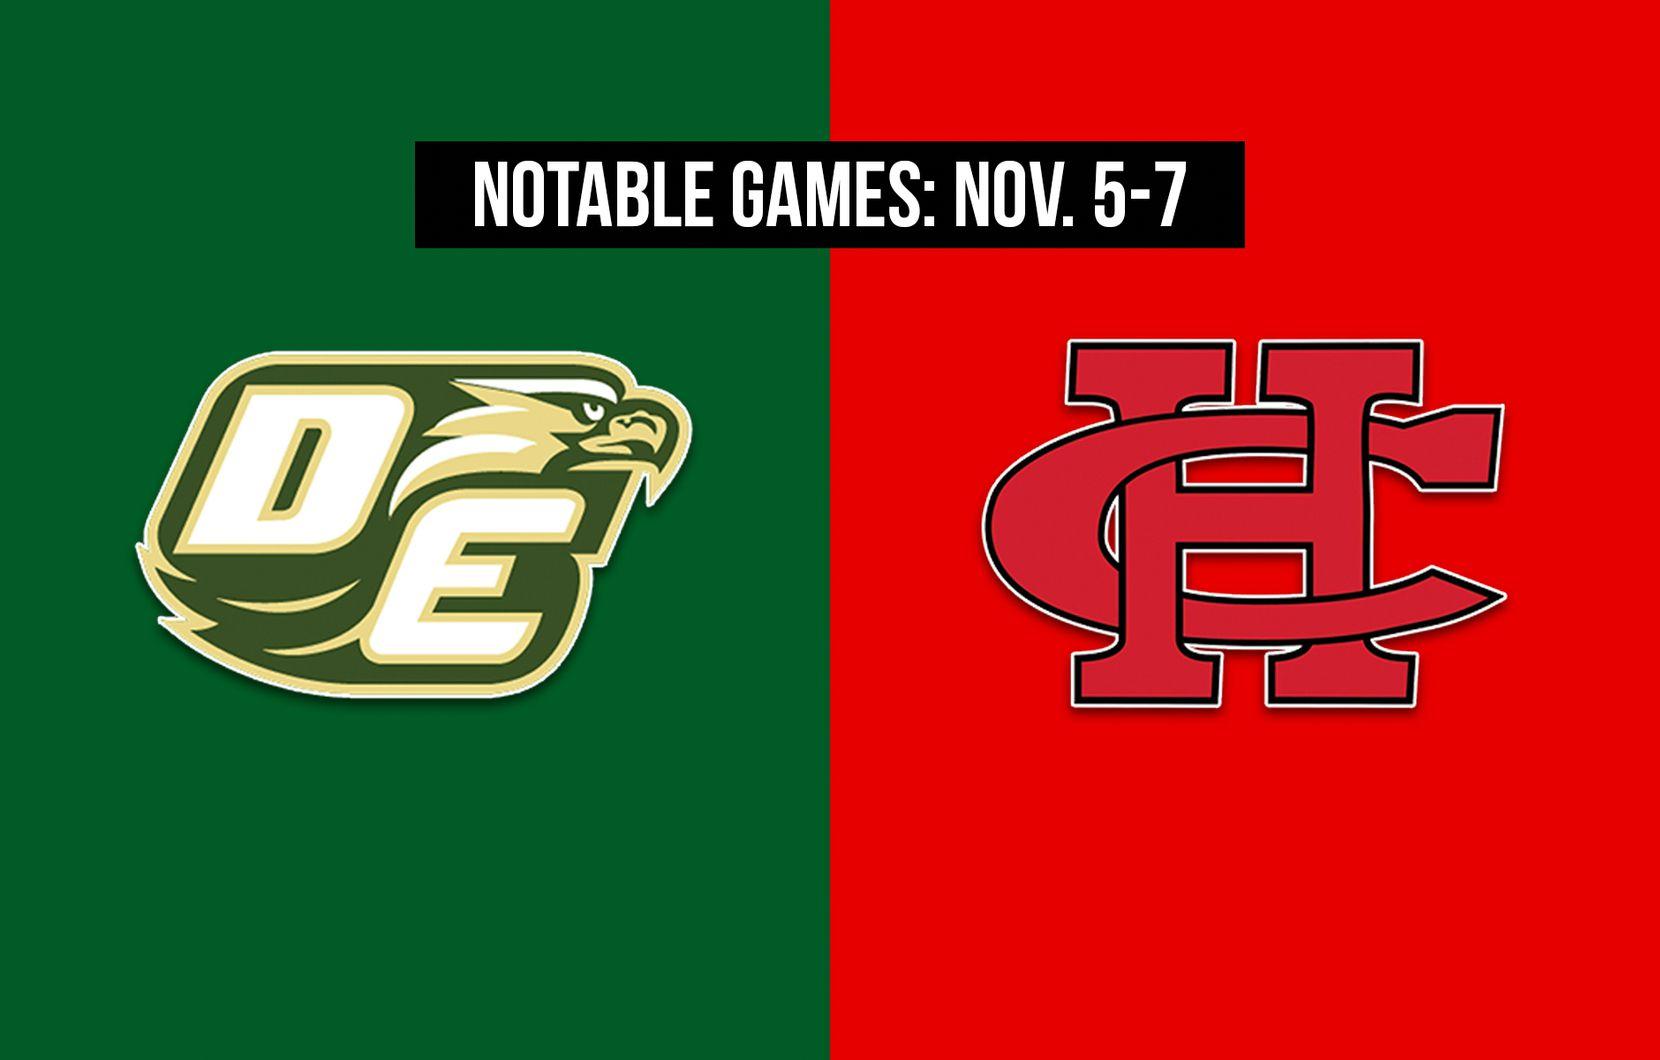 Notable games for the week of Nov. 5-7 of the 2020 season: DeSoto vs. Cedar Hill.